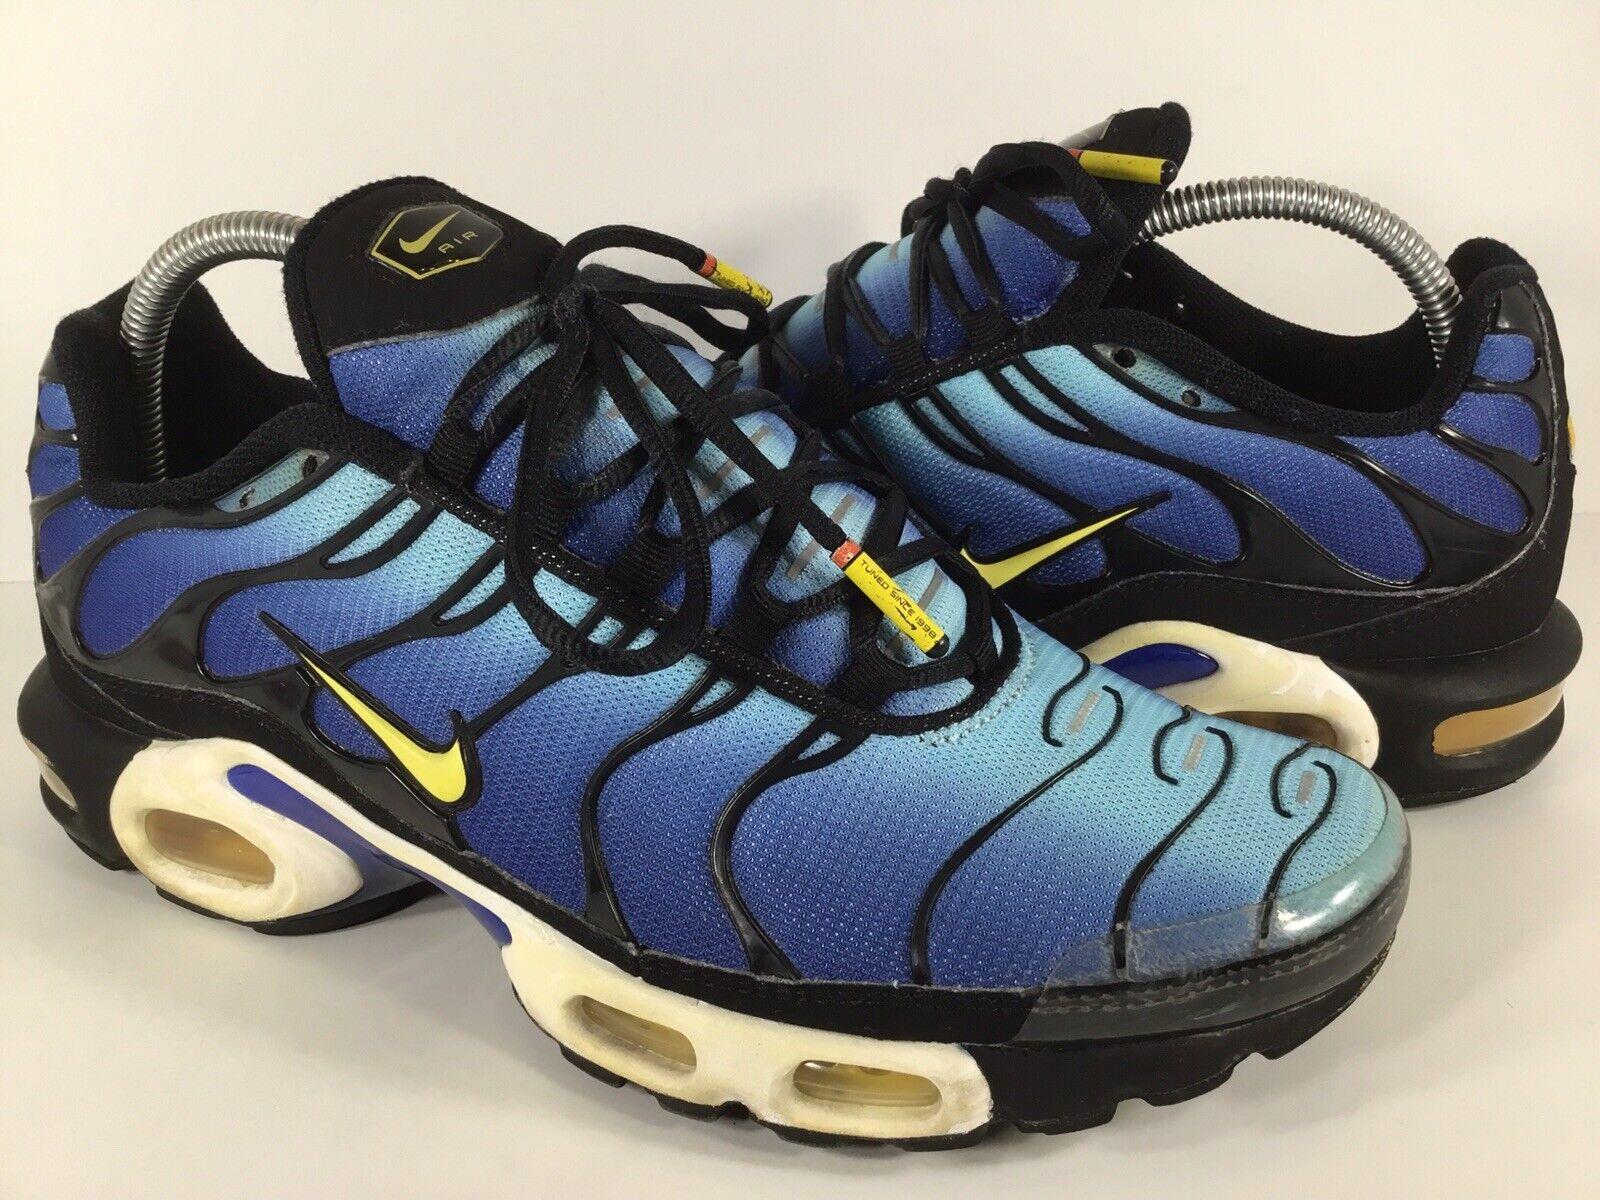 5d3db93d54 Nike Air Max Plus TN Tuned HYPER Blue Shoes Chamois-black Sz 6 ...